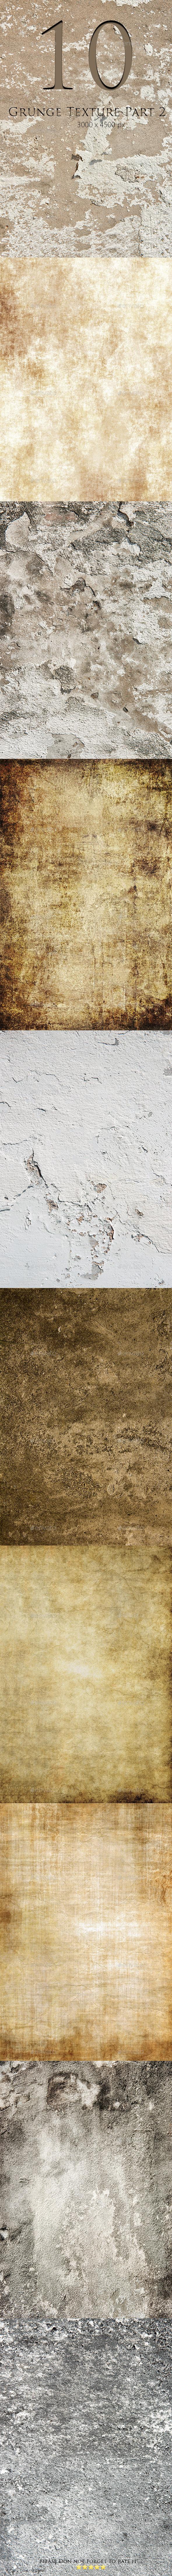 10 Grunge Texture Part 2 - Textures